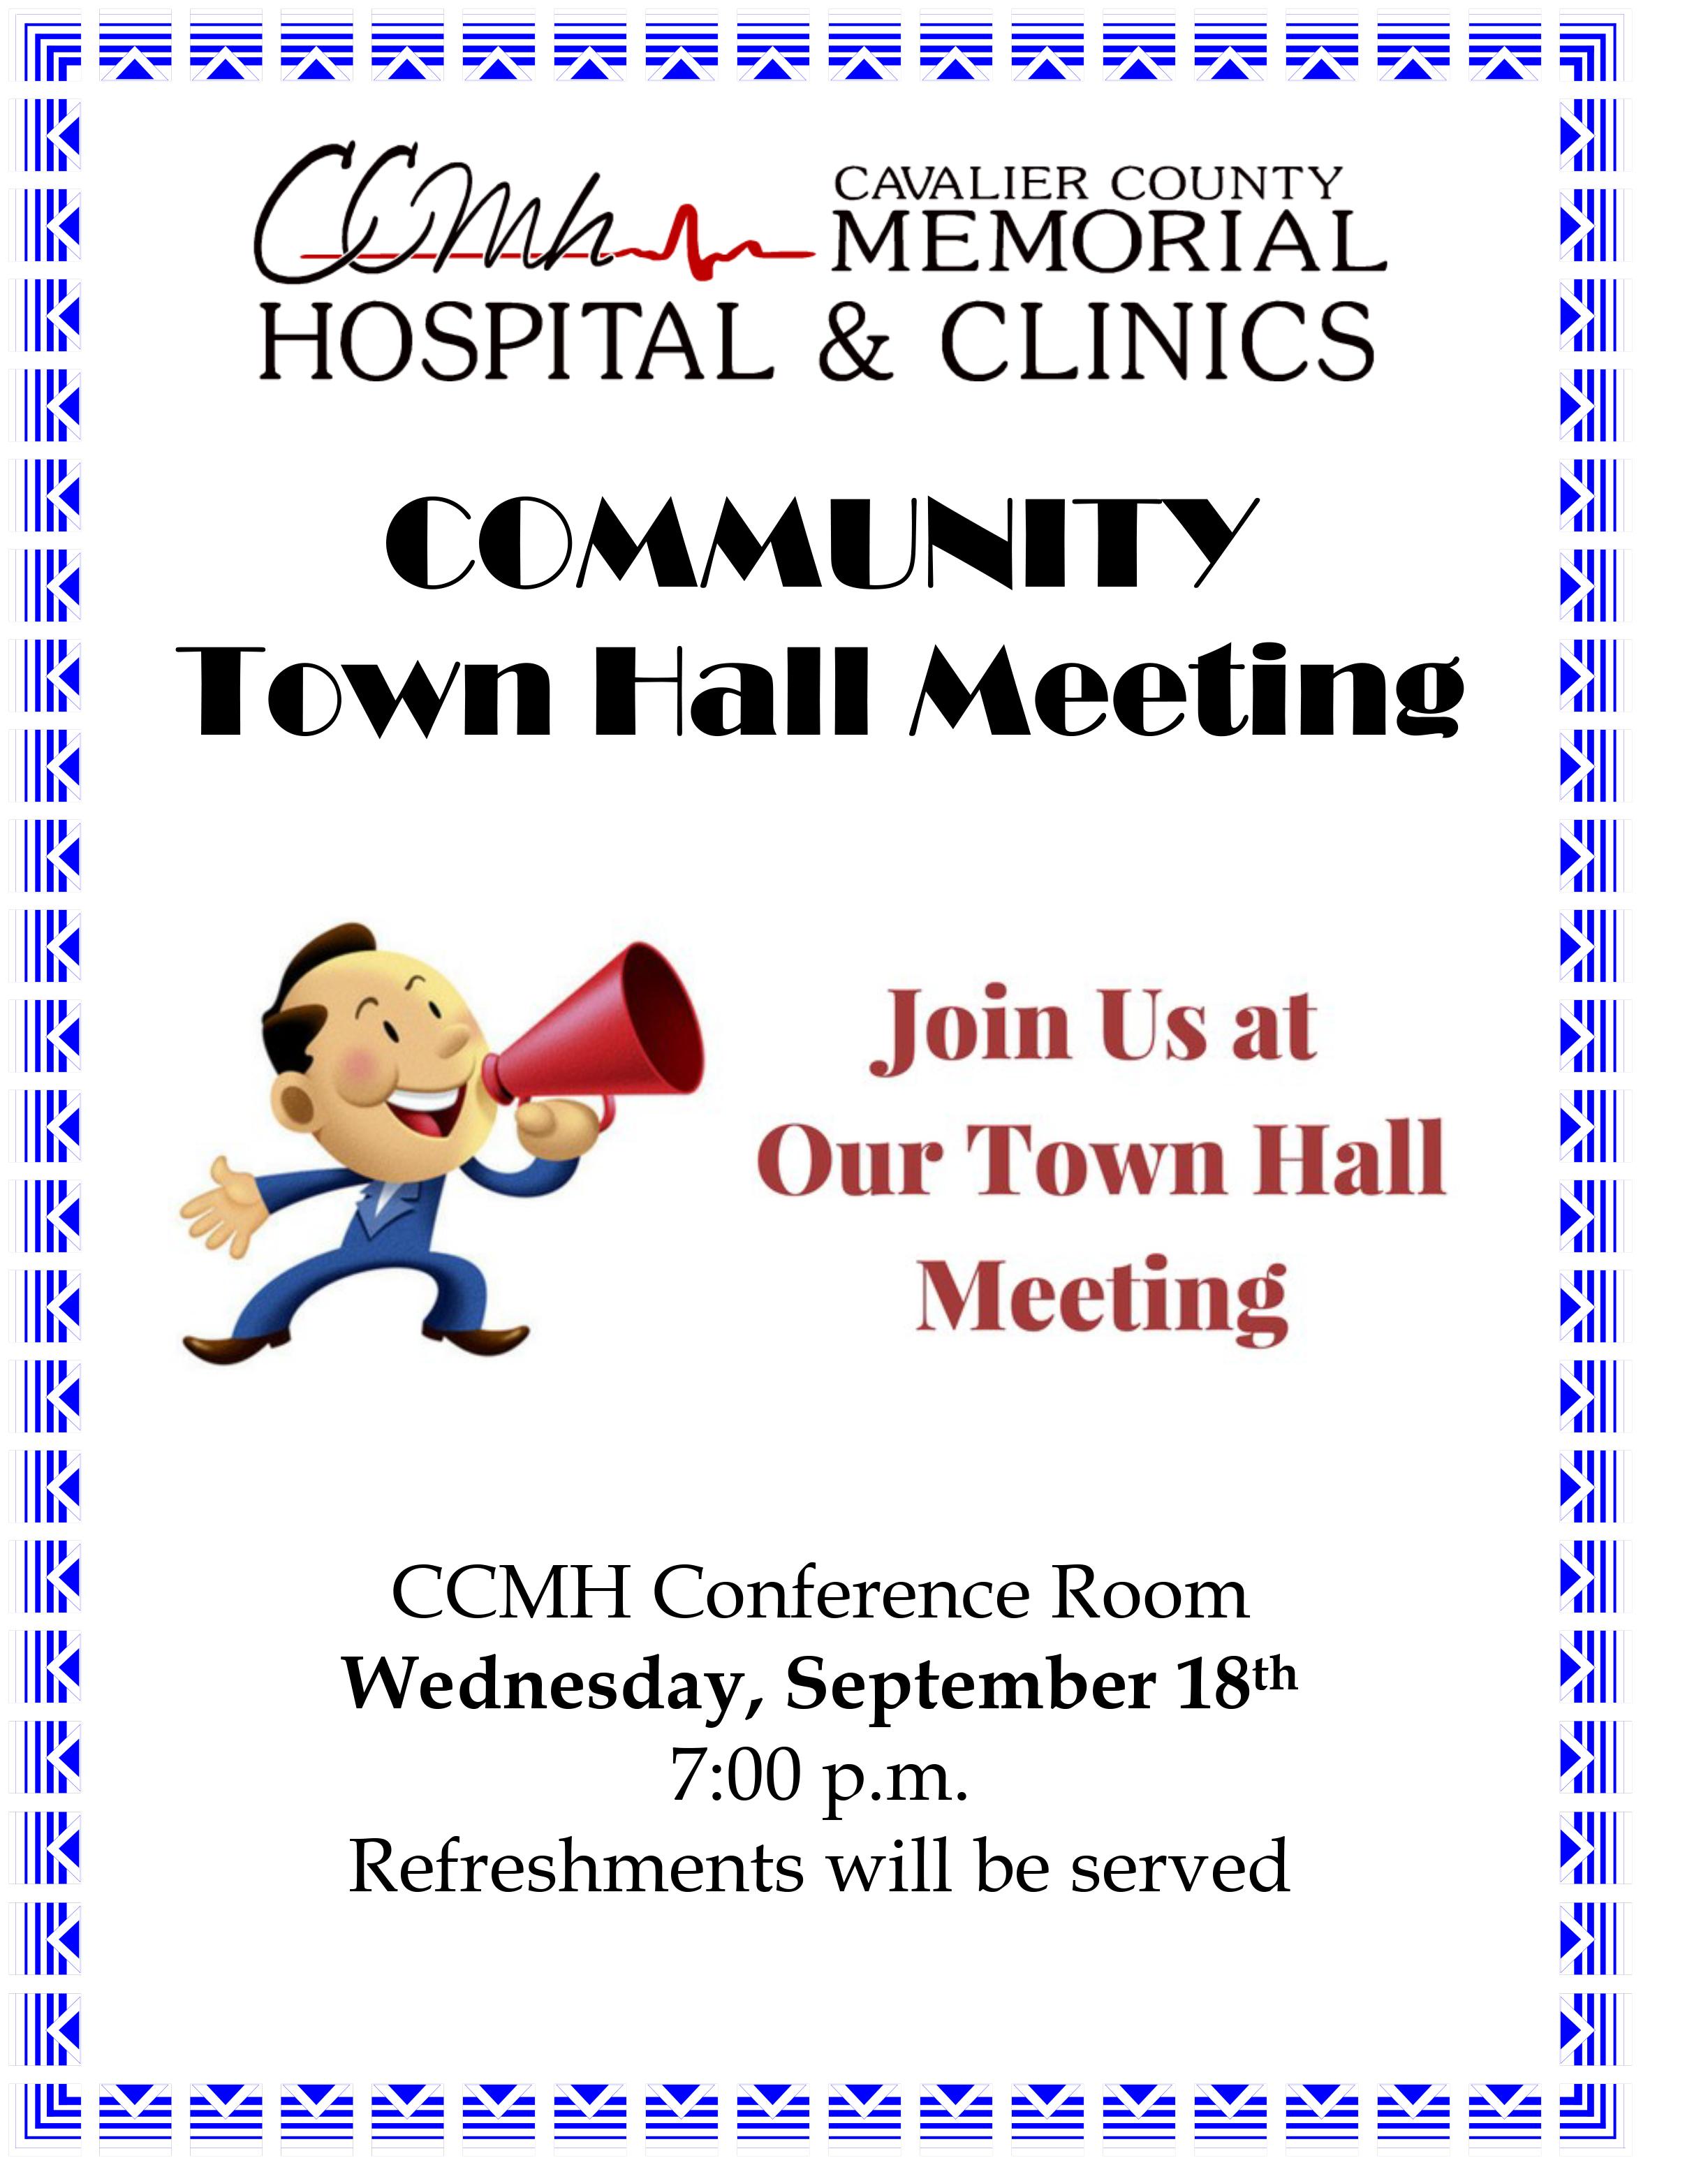 Town Hall Meeting Community.jpg